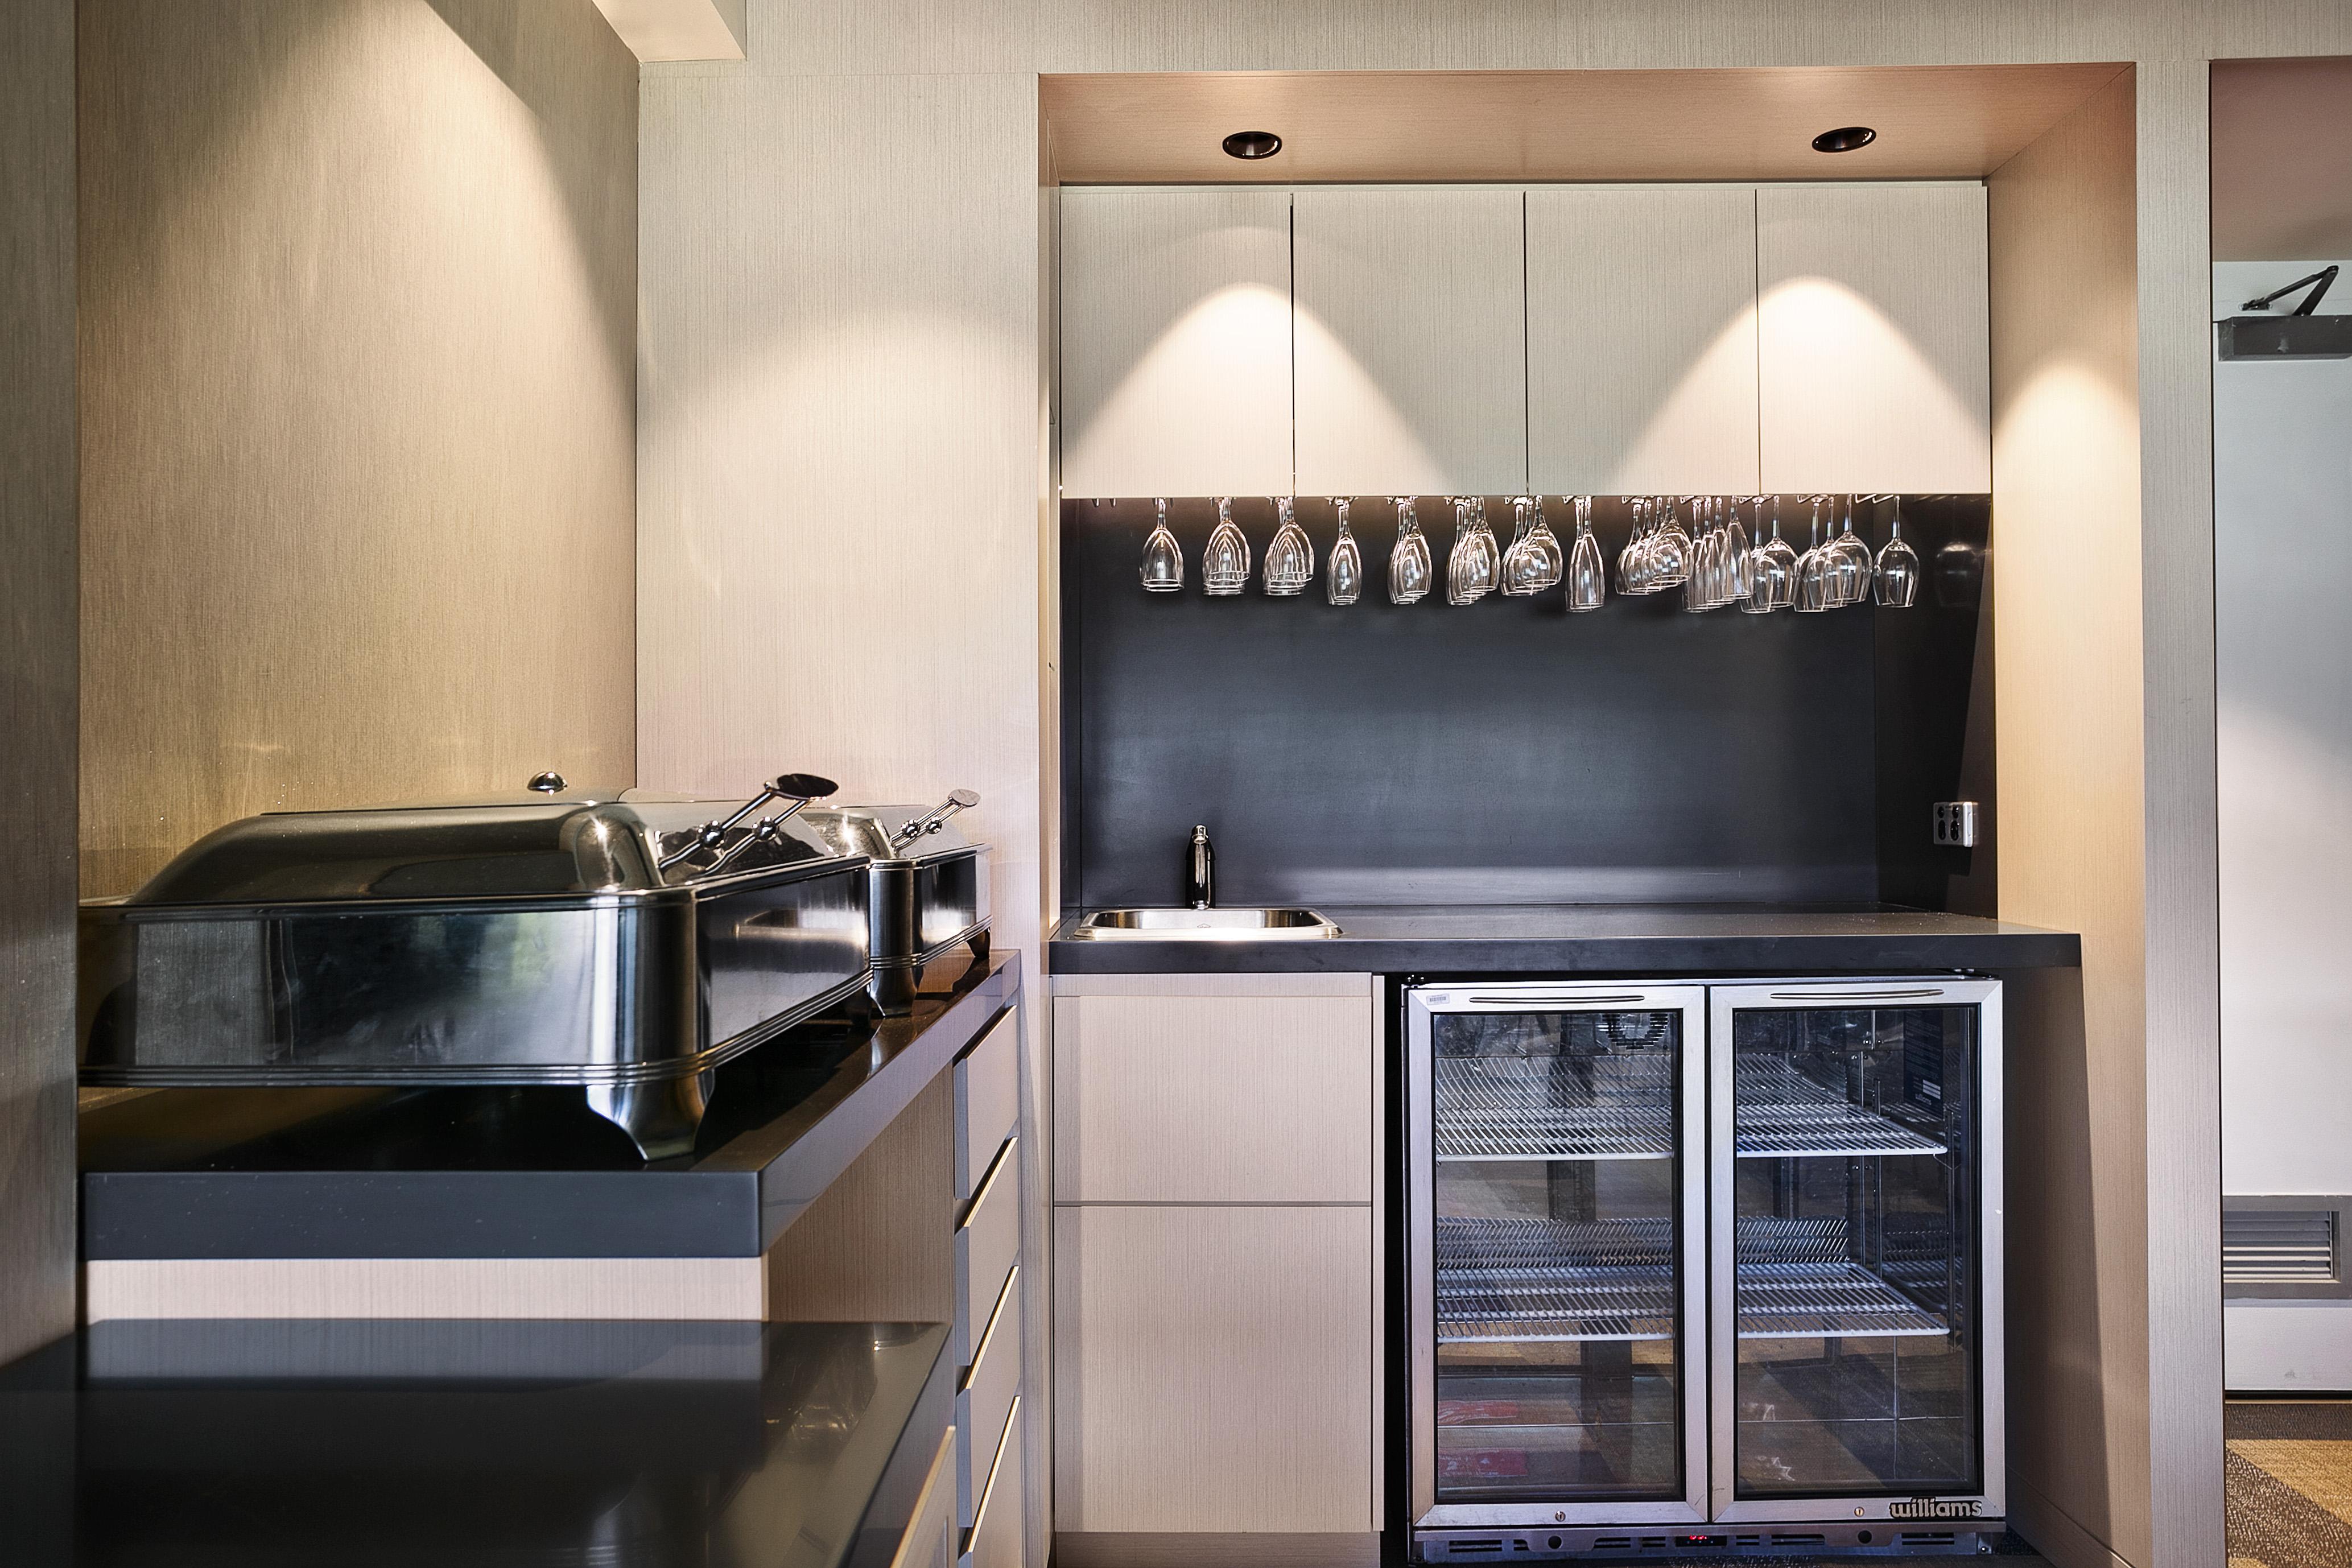 3ce0a400-0ae3-0135-47c7-7222926b388b_Kitchen